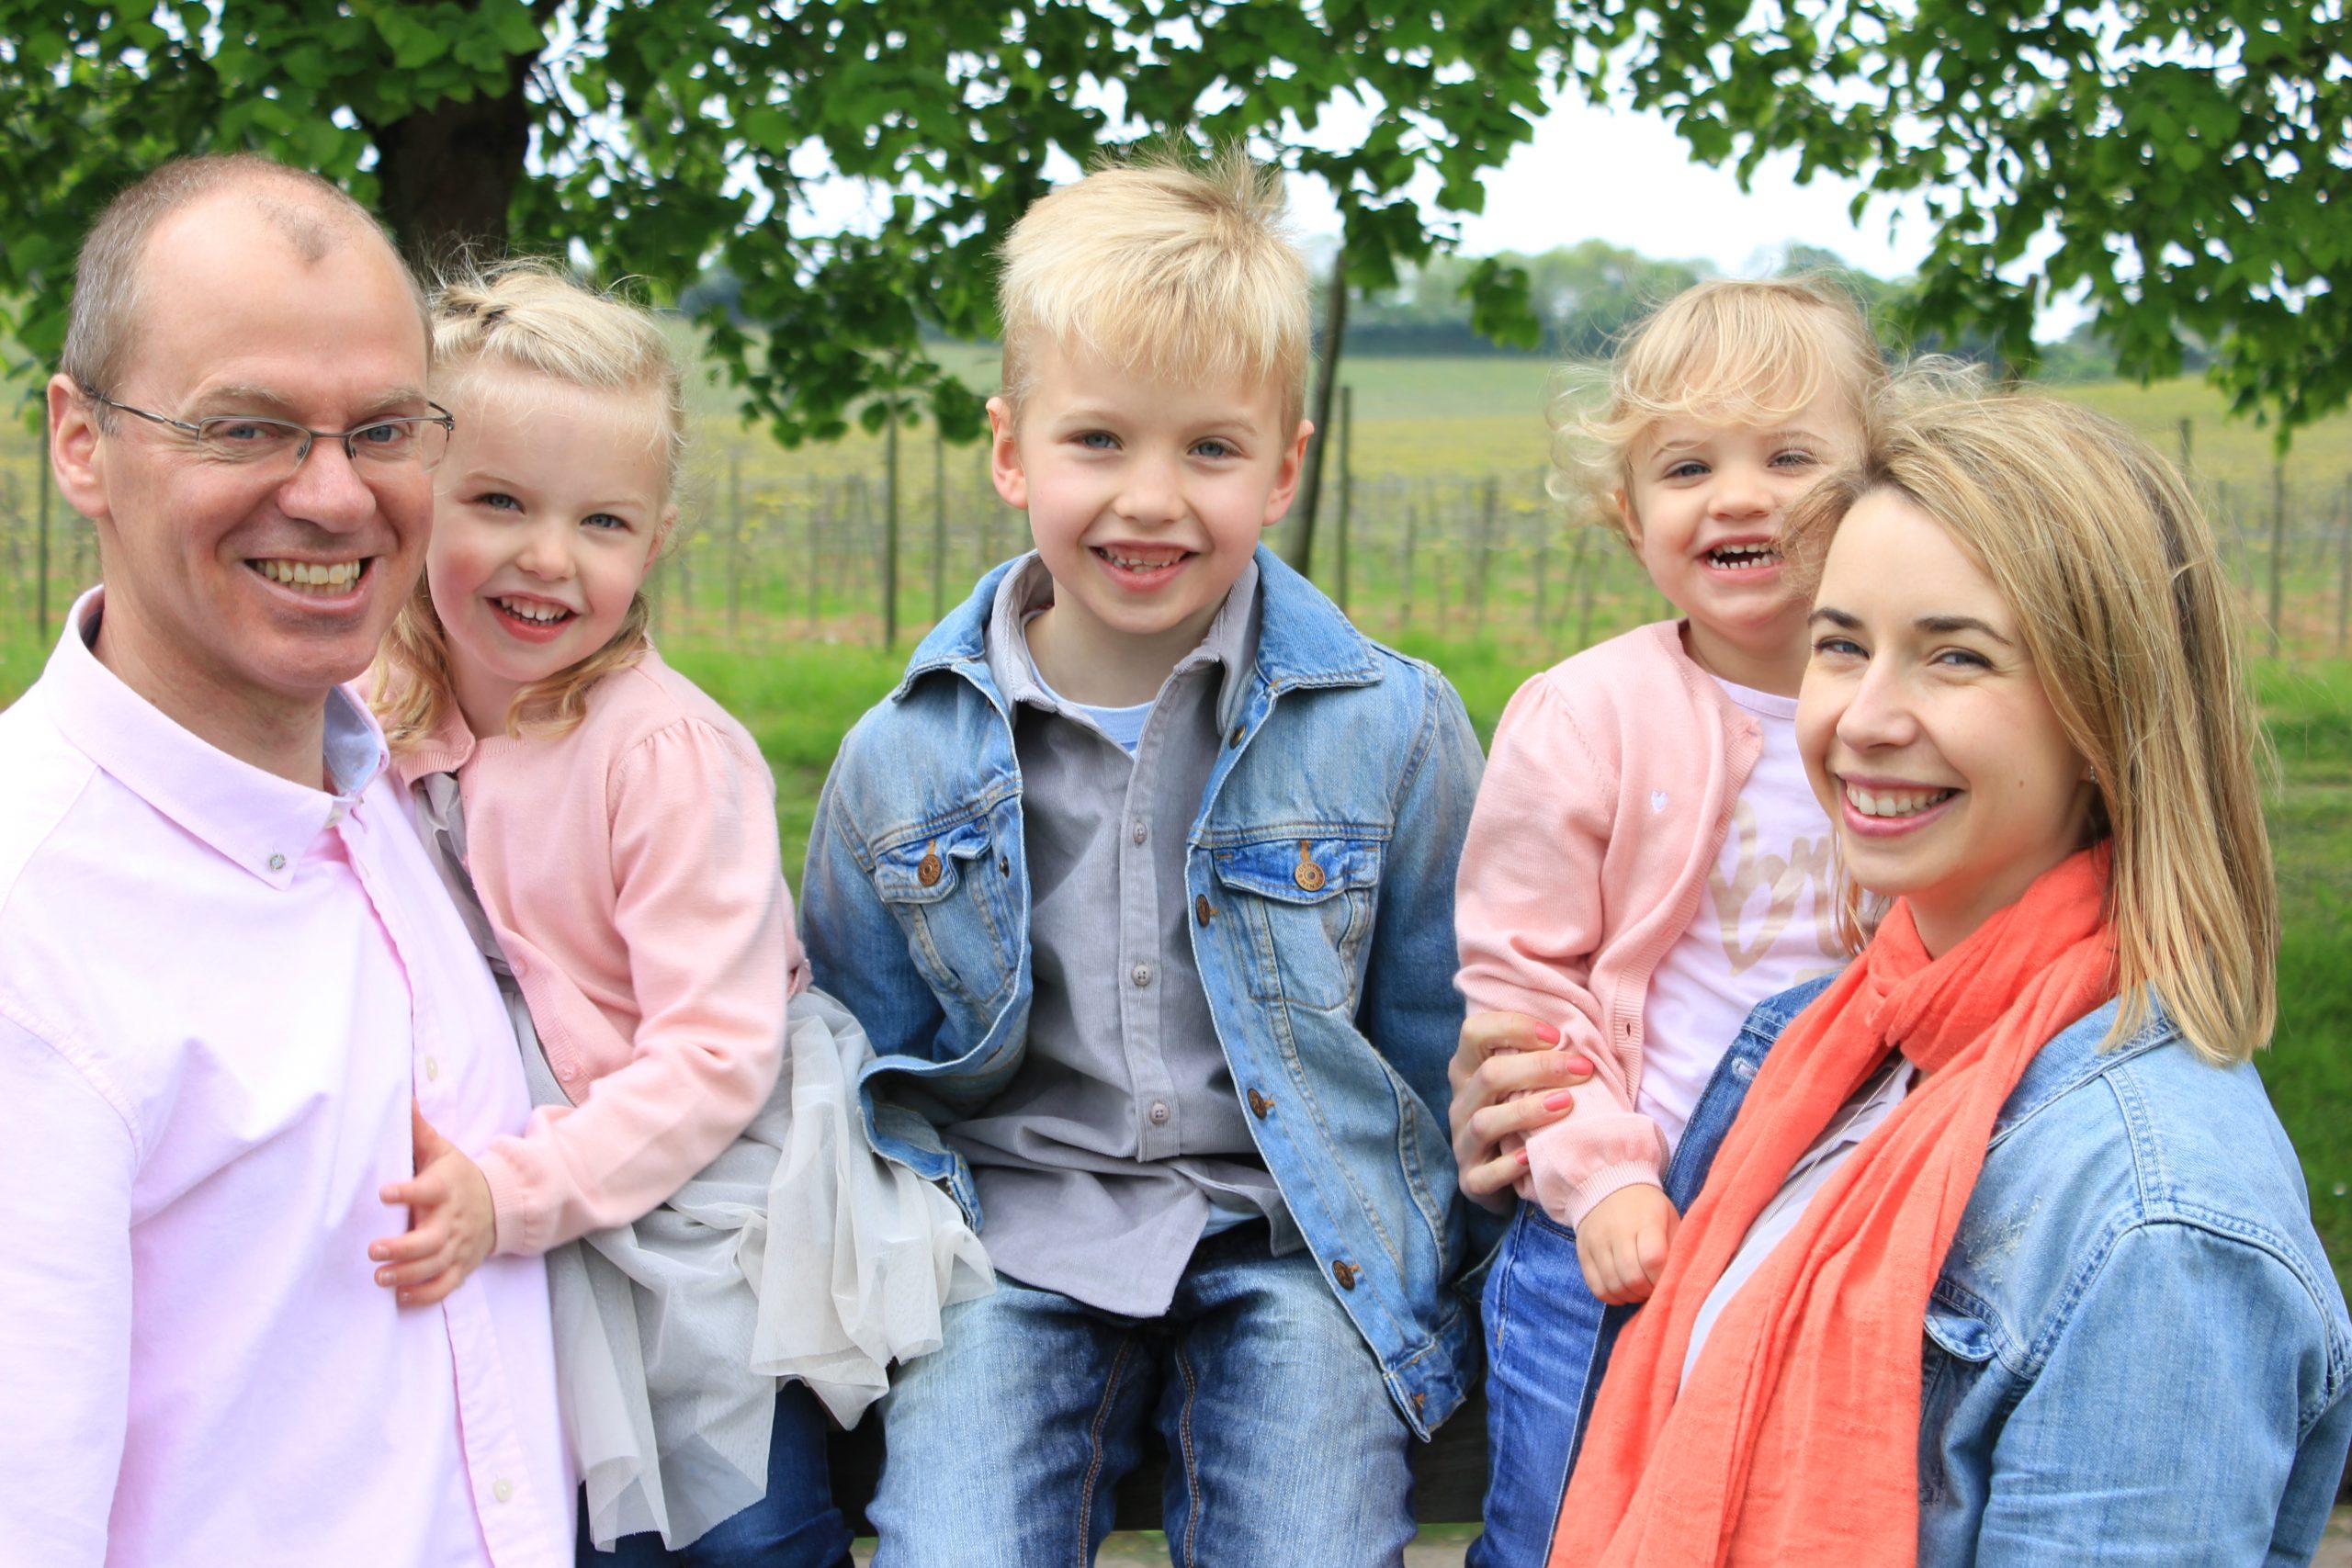 Family photoshoot in vineyards